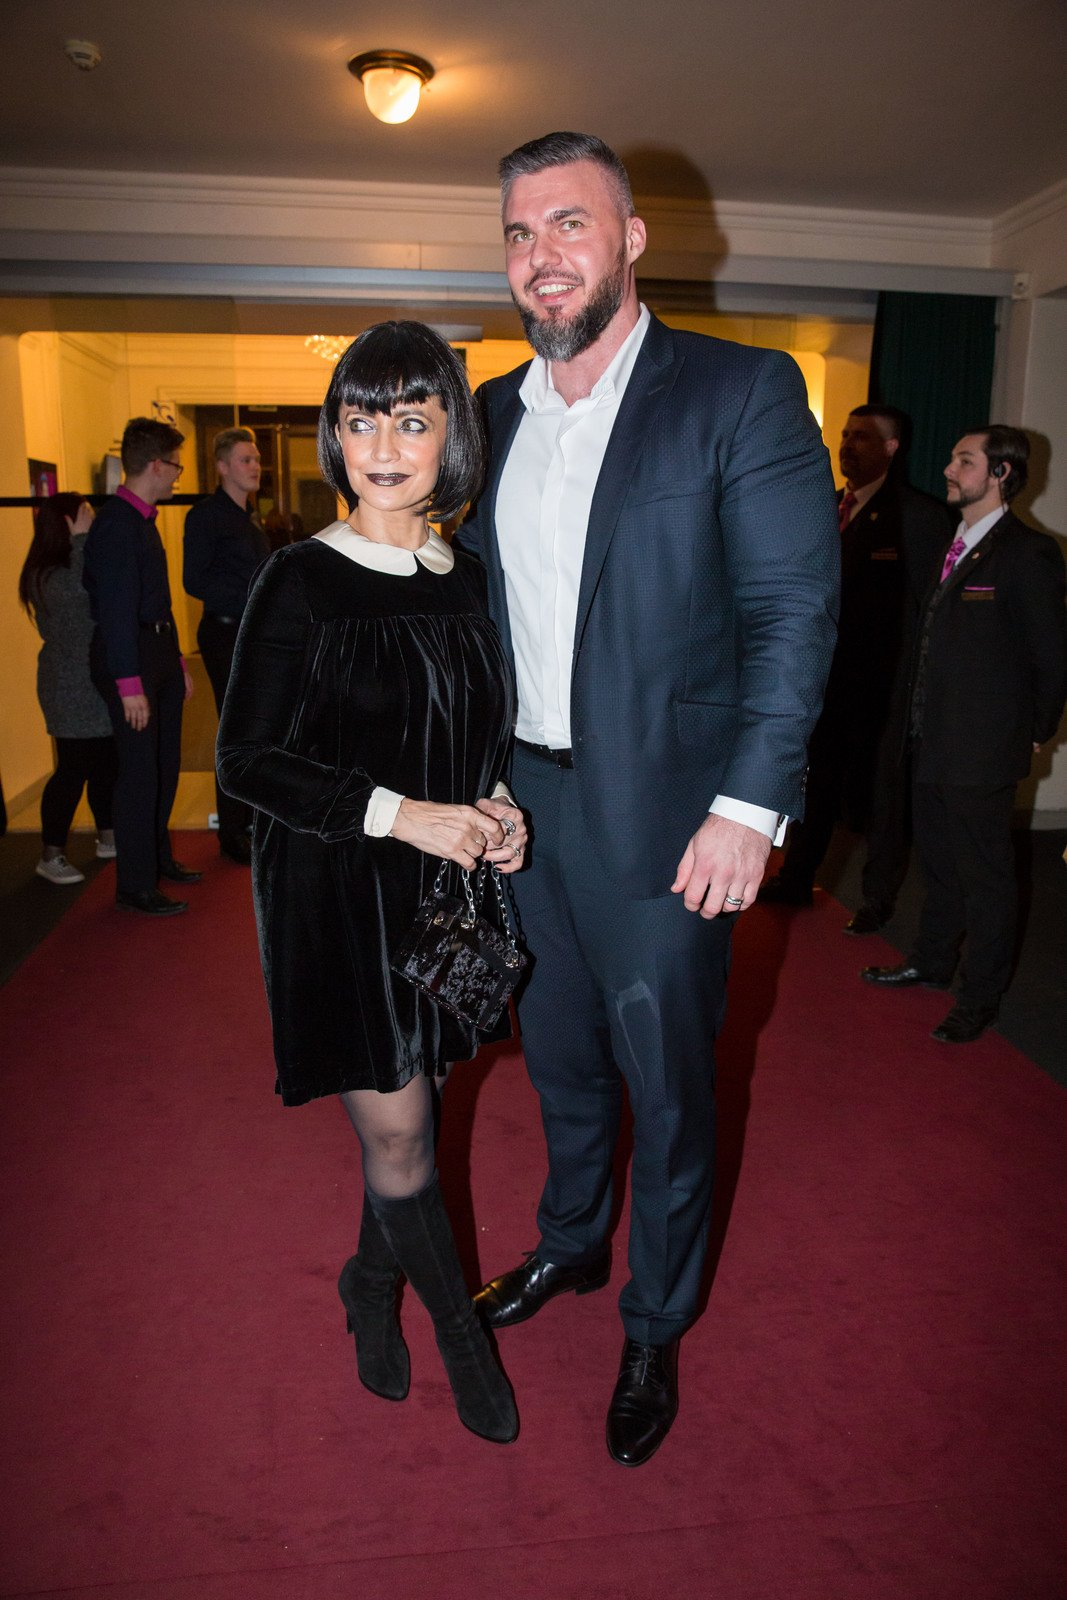 Lucie Bílá s partnerem Radkem Filipi na obnovené premiéře muzikálu The Addams Family.